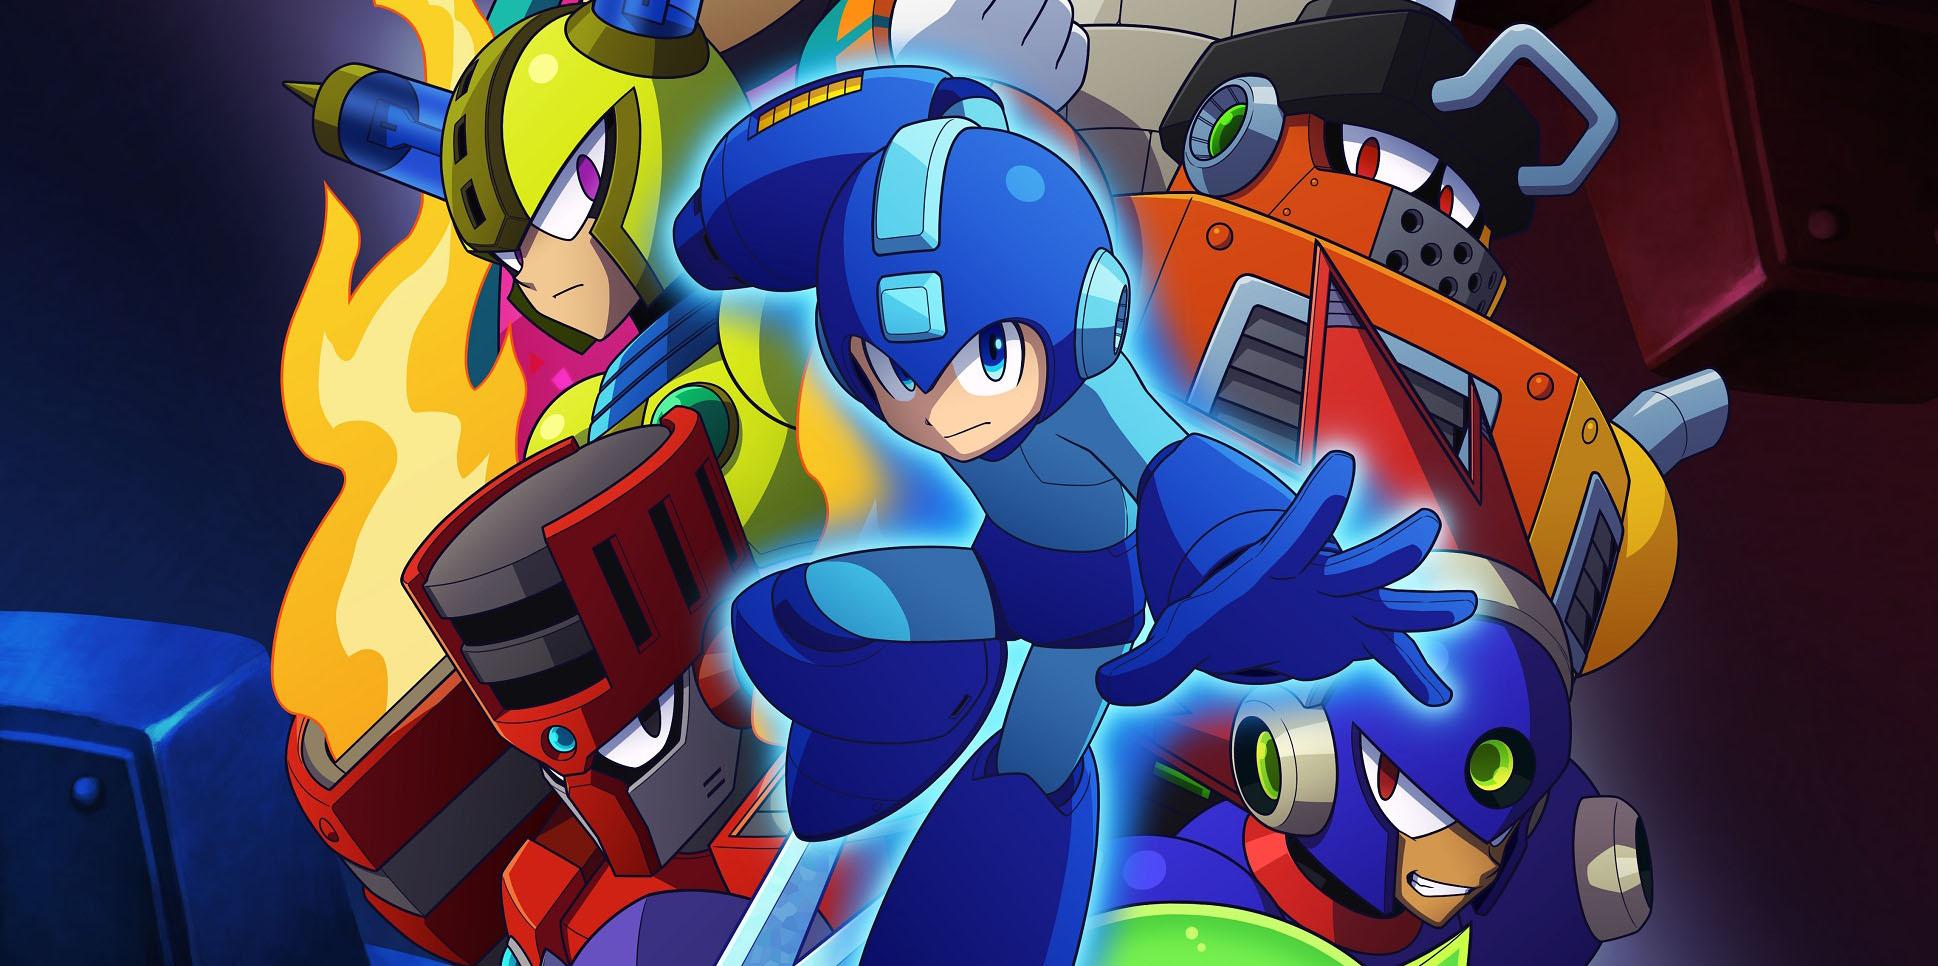 Mega Man 11 Review - Retorno Bodacious do bombardeiro azul